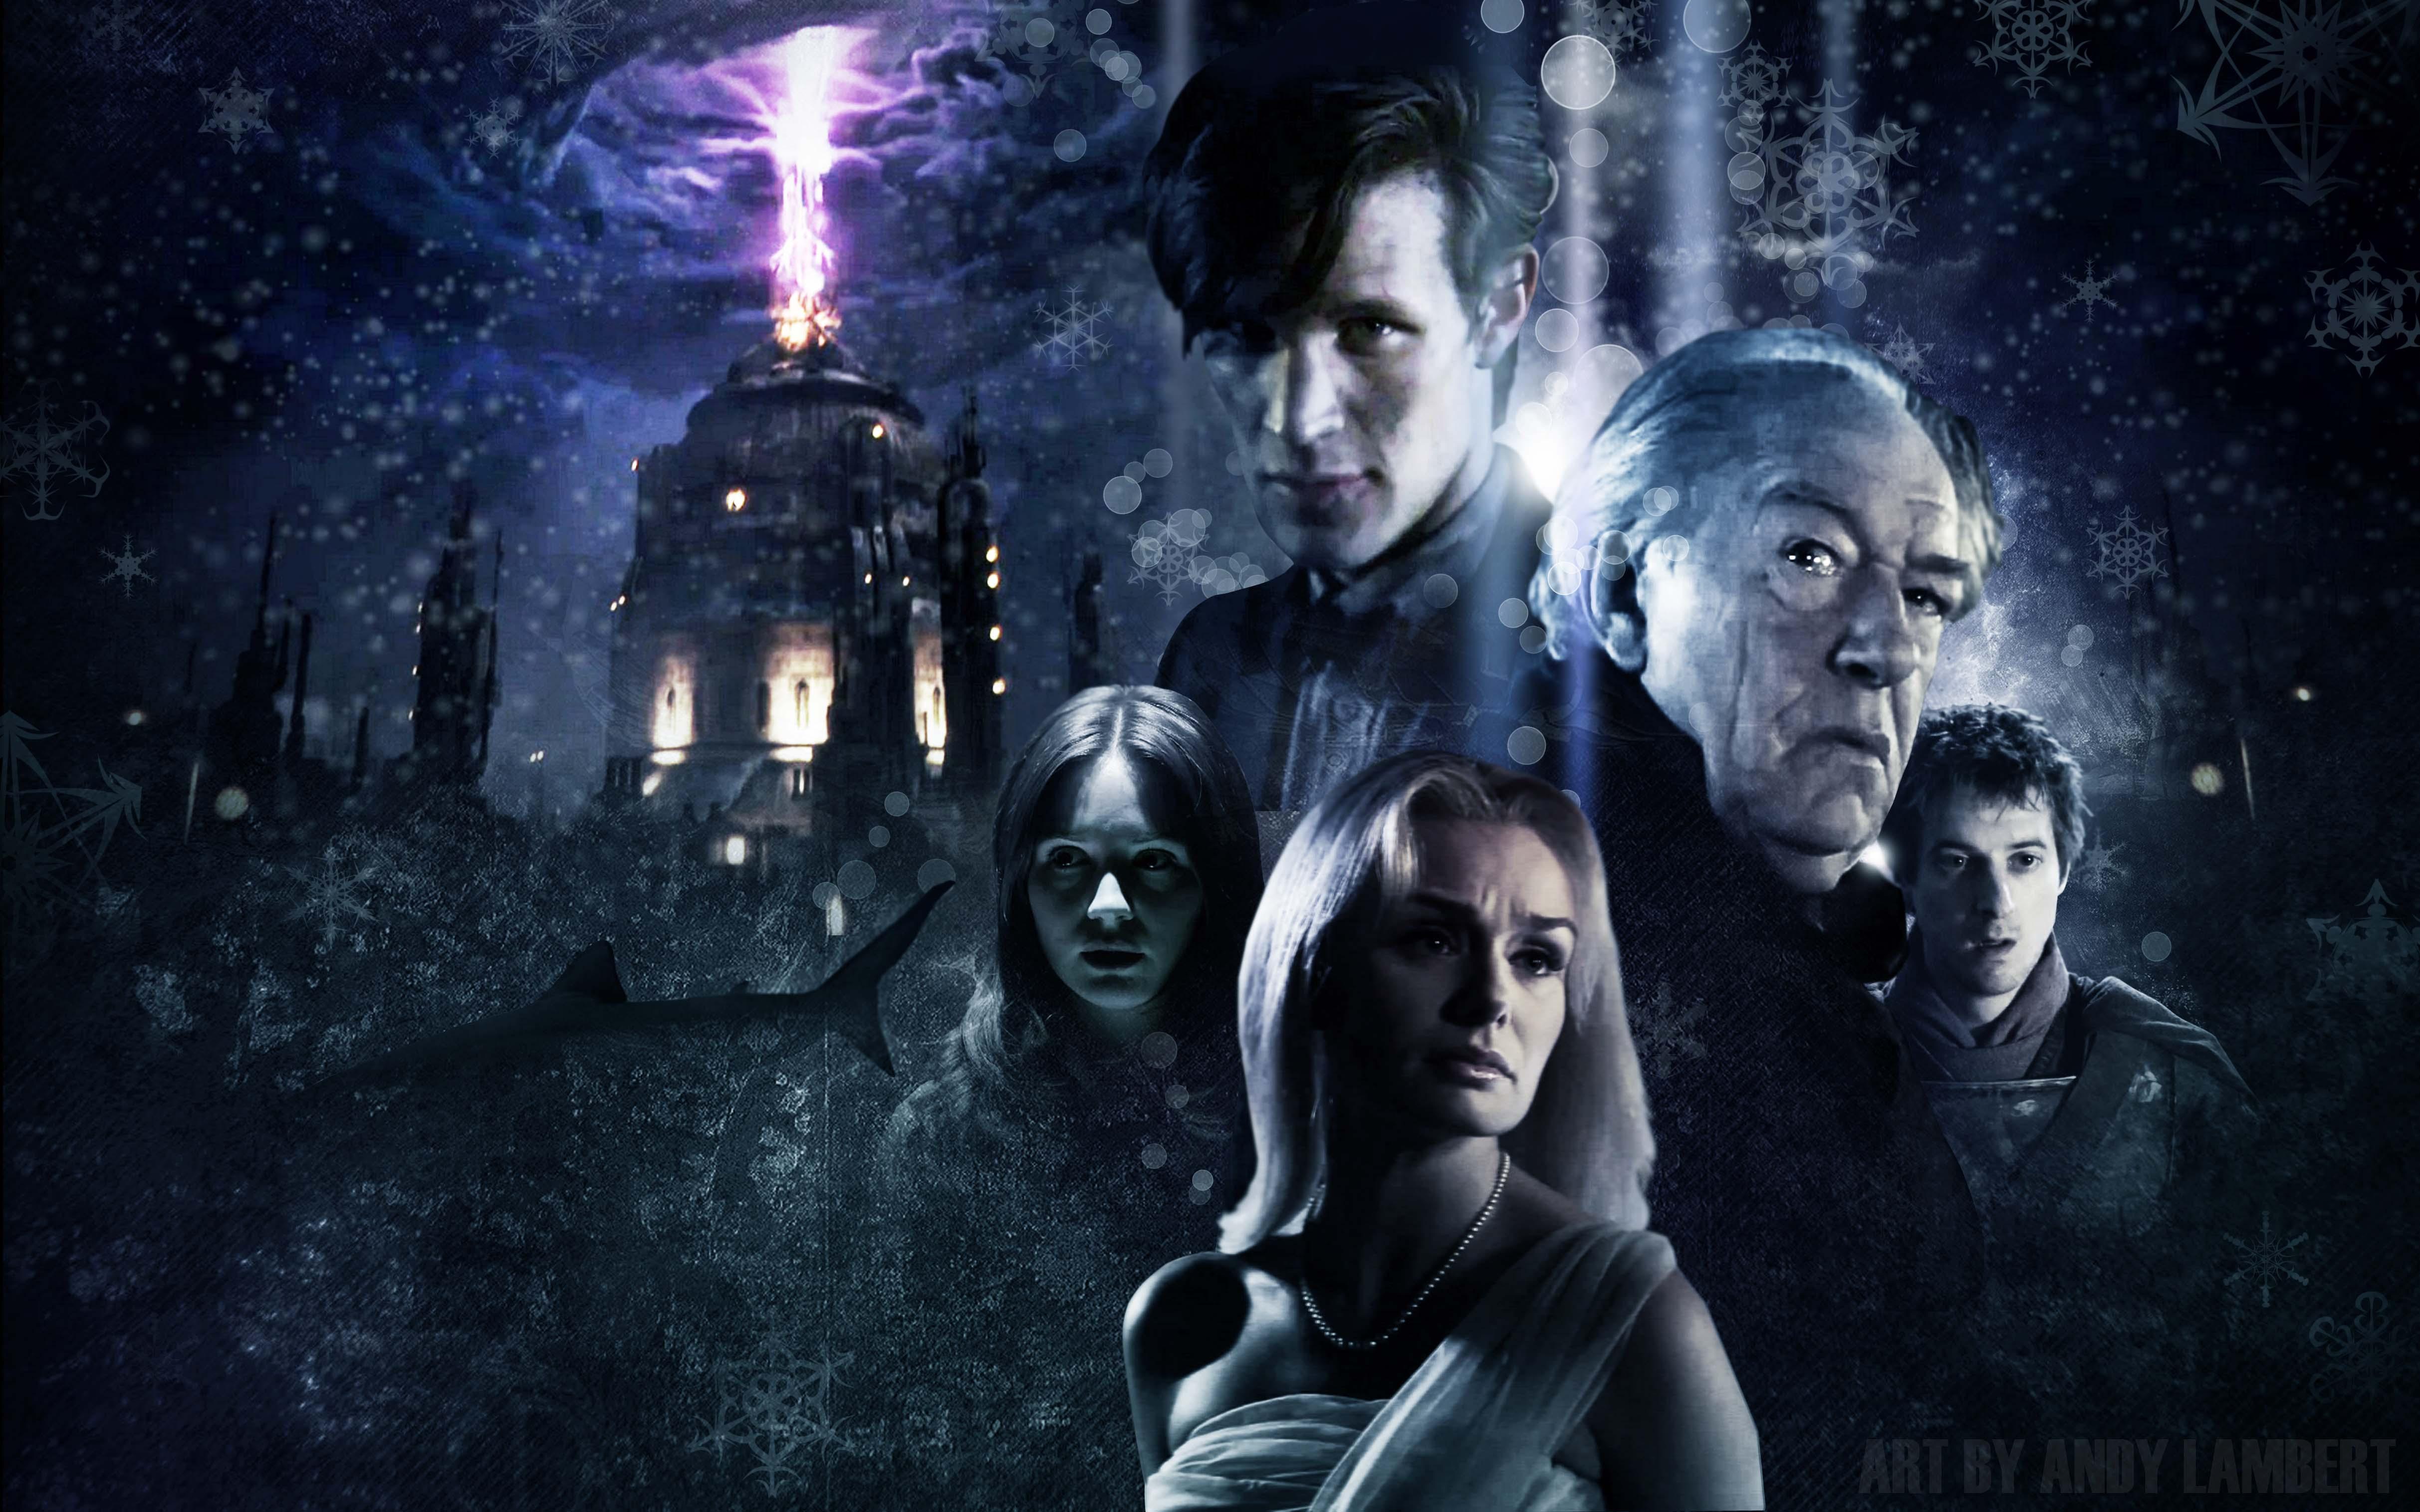 Doctor Who Wallpapers Matt Smith - Wallpaper Cave